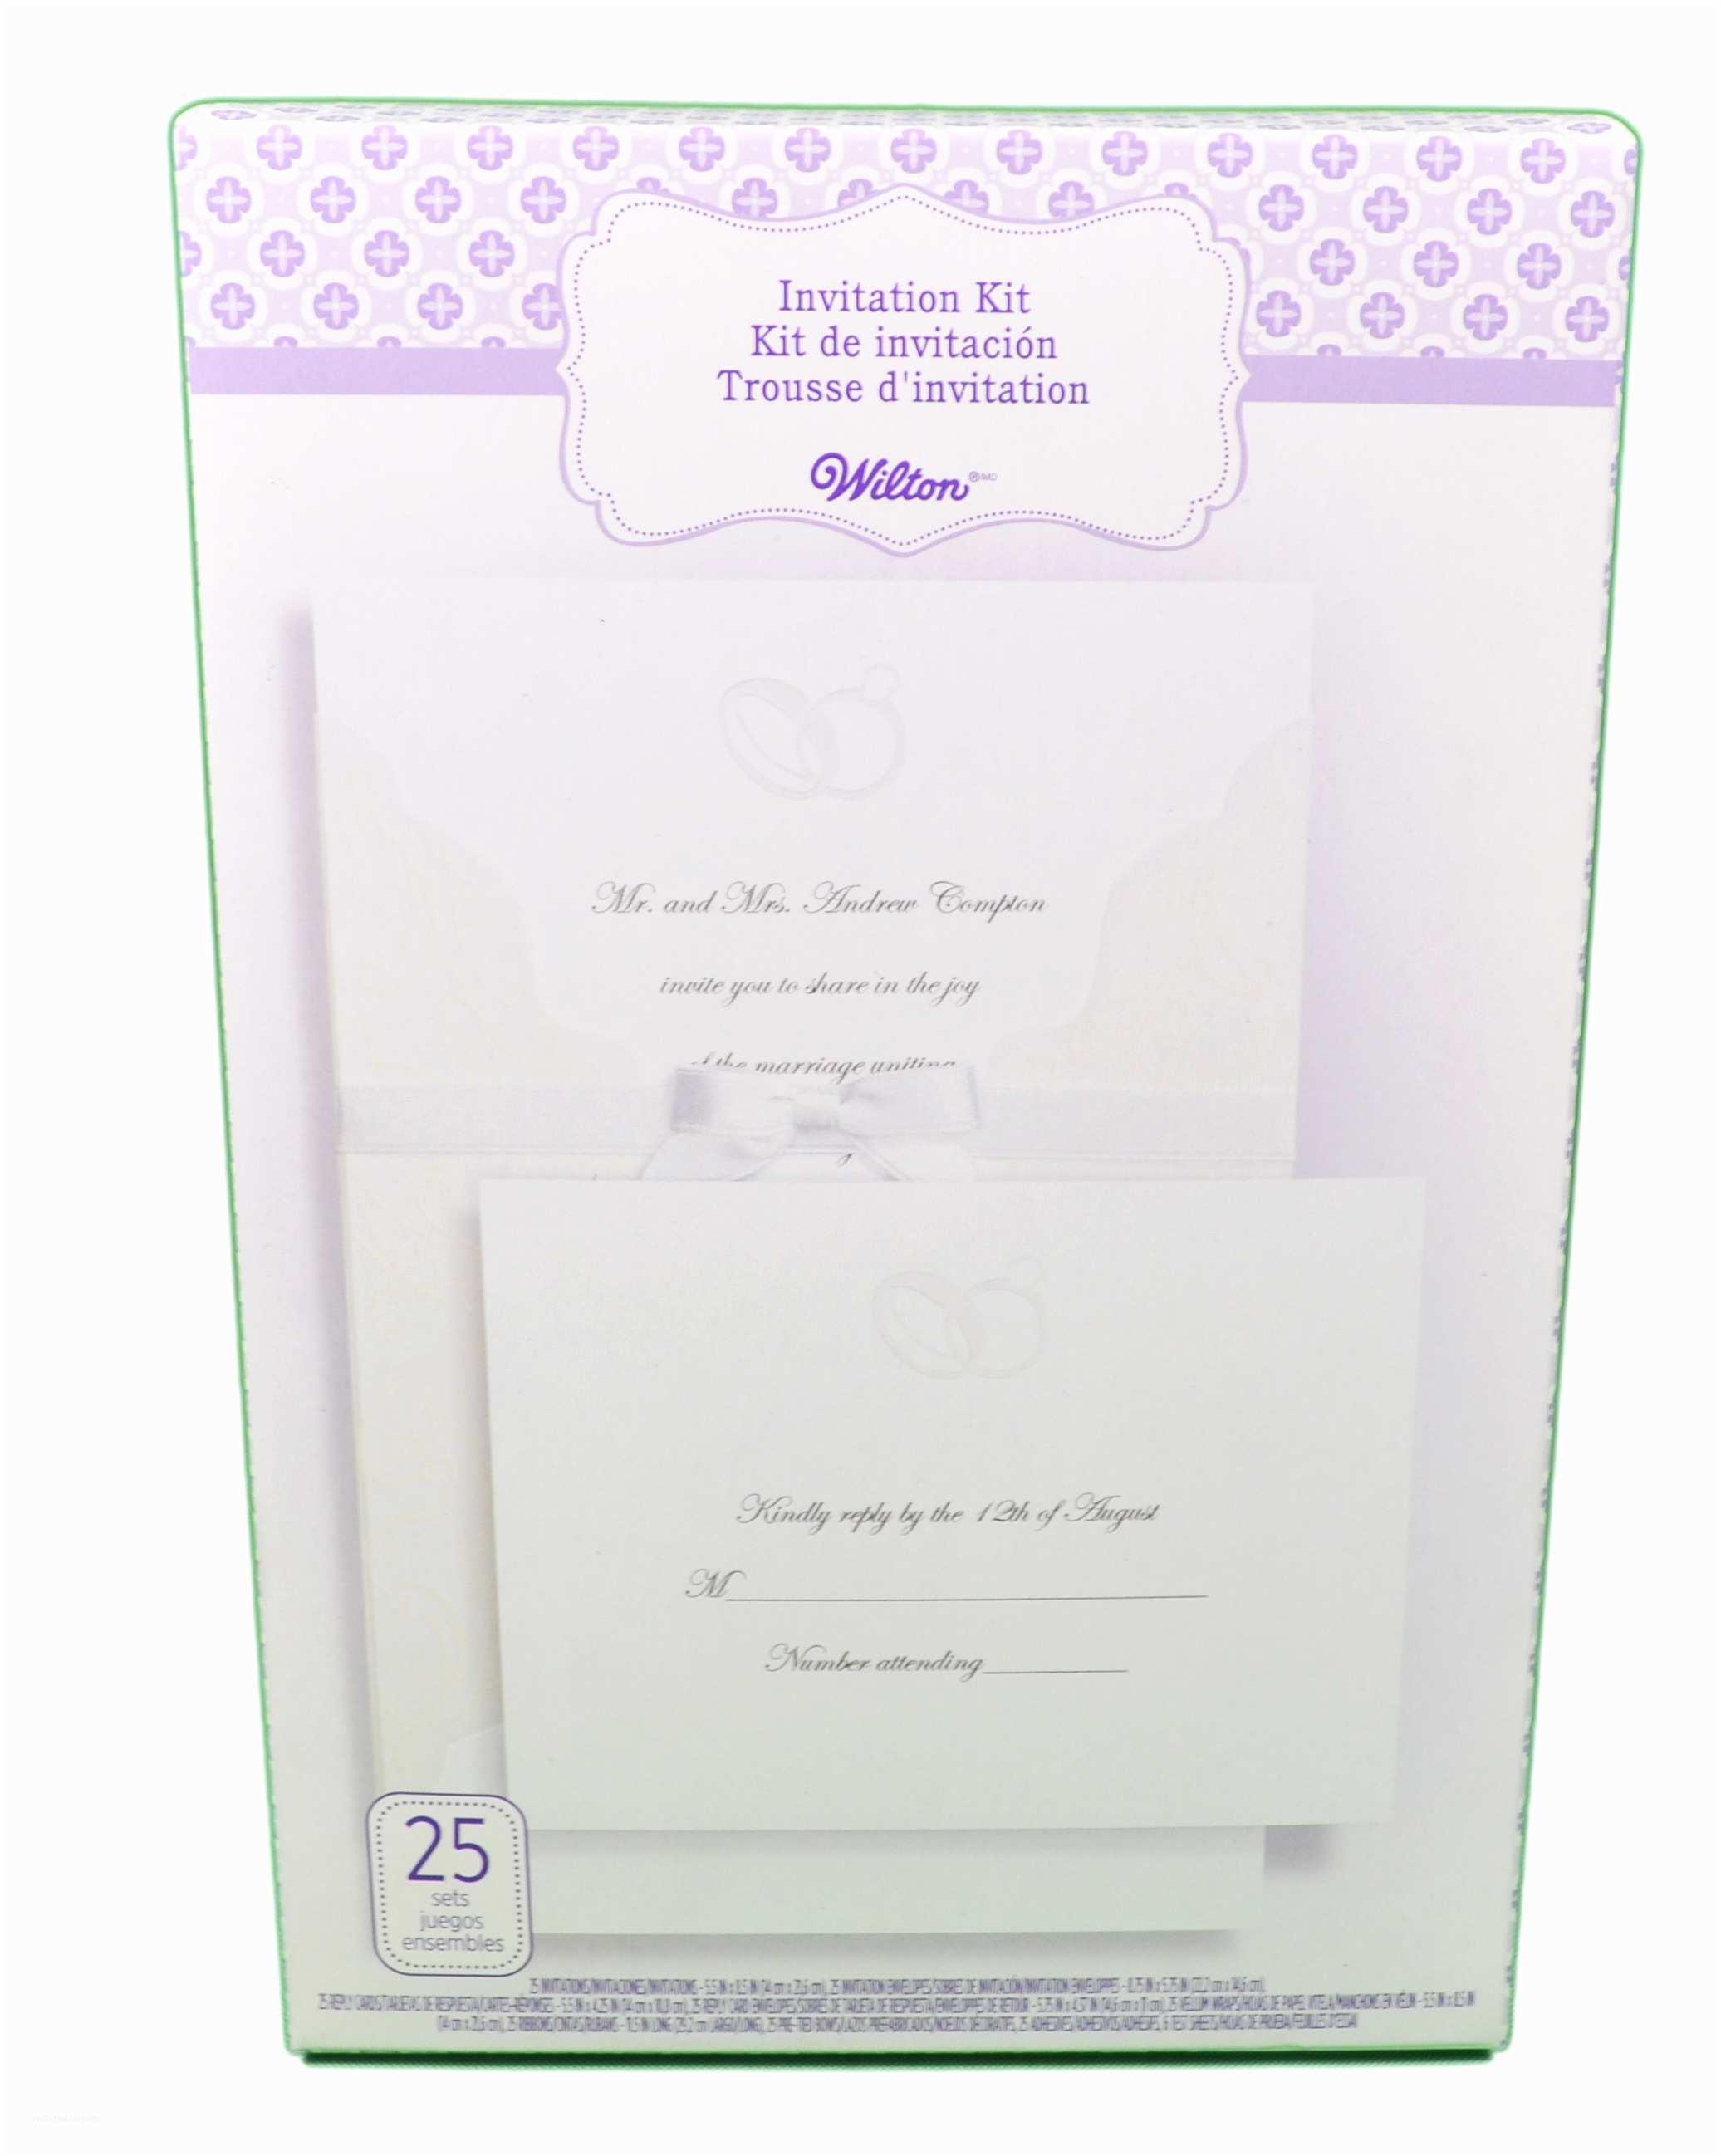 Wilton Wedding Invitation Kits Wilton Wedding Invitation Kit Embellished Rings 25 Count